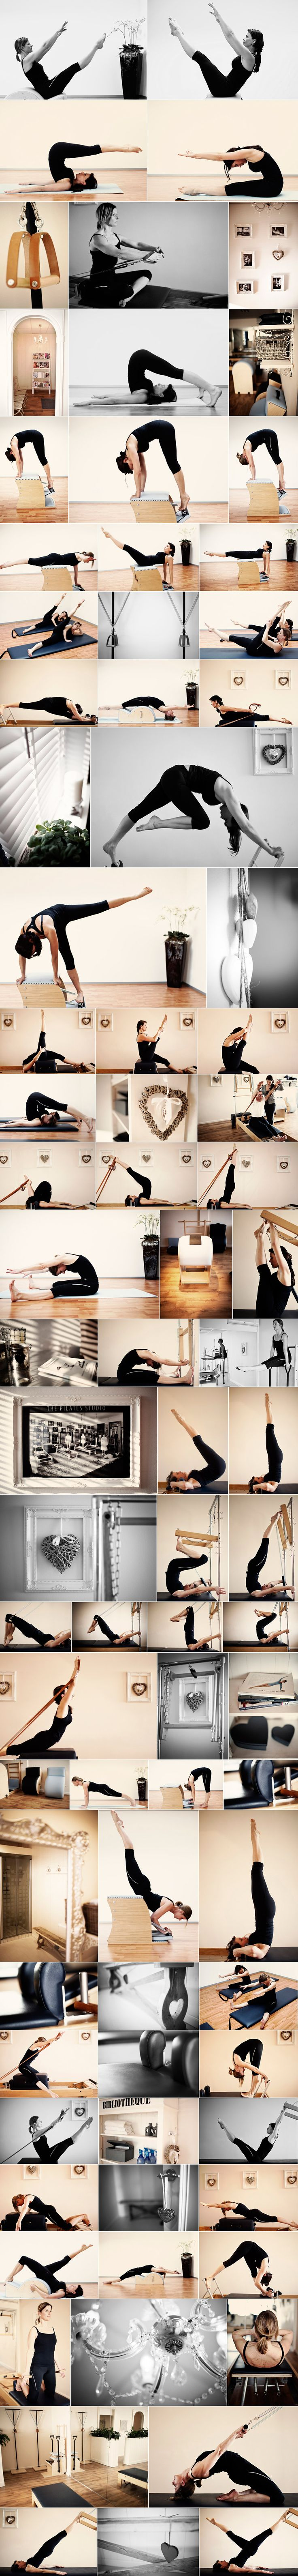 Pilates Reformer - My favorite workout - I love it!